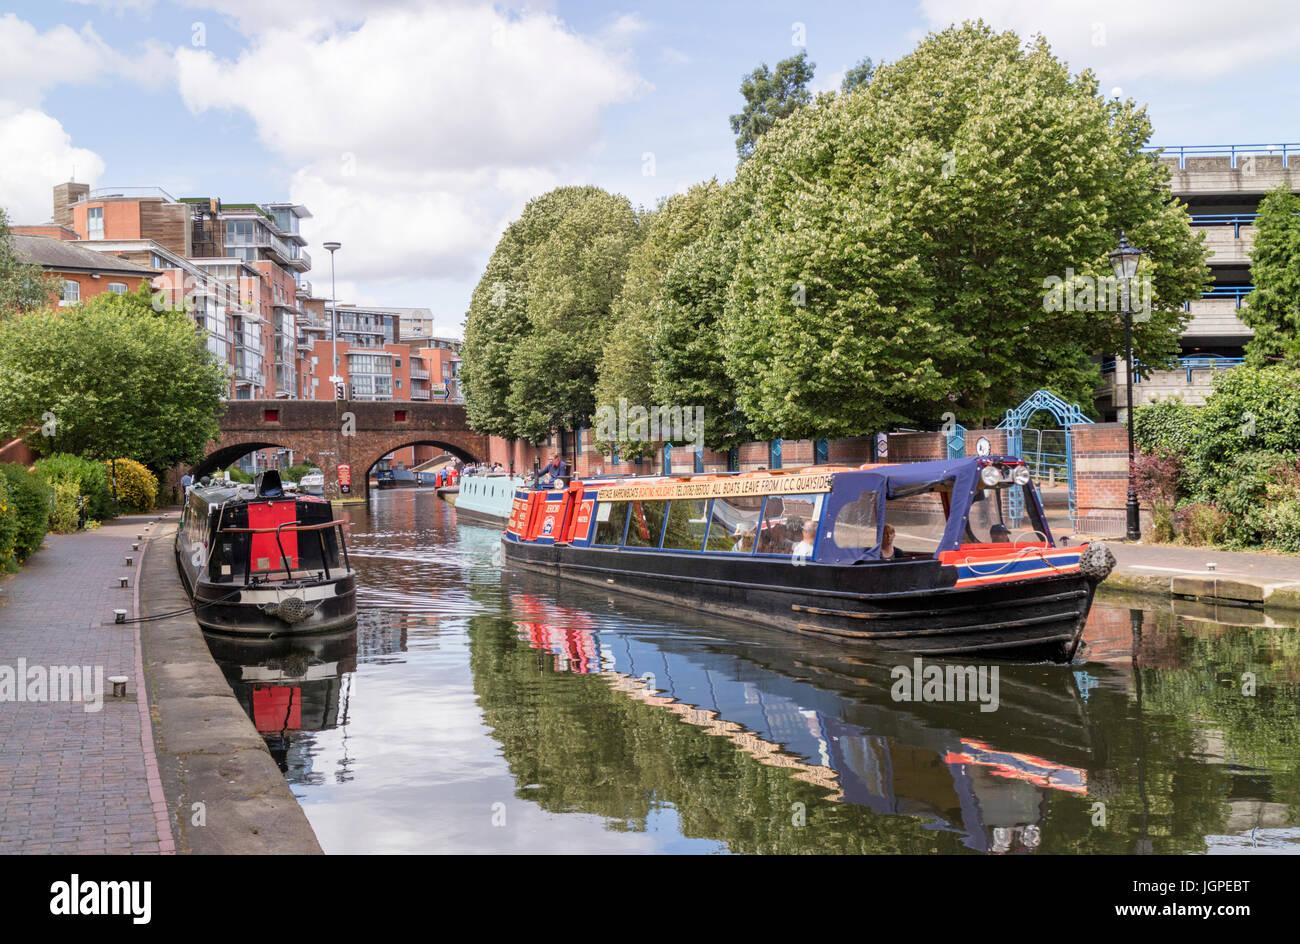 Birmingham canal navergations, Birmingham, England, UK - Stock Image